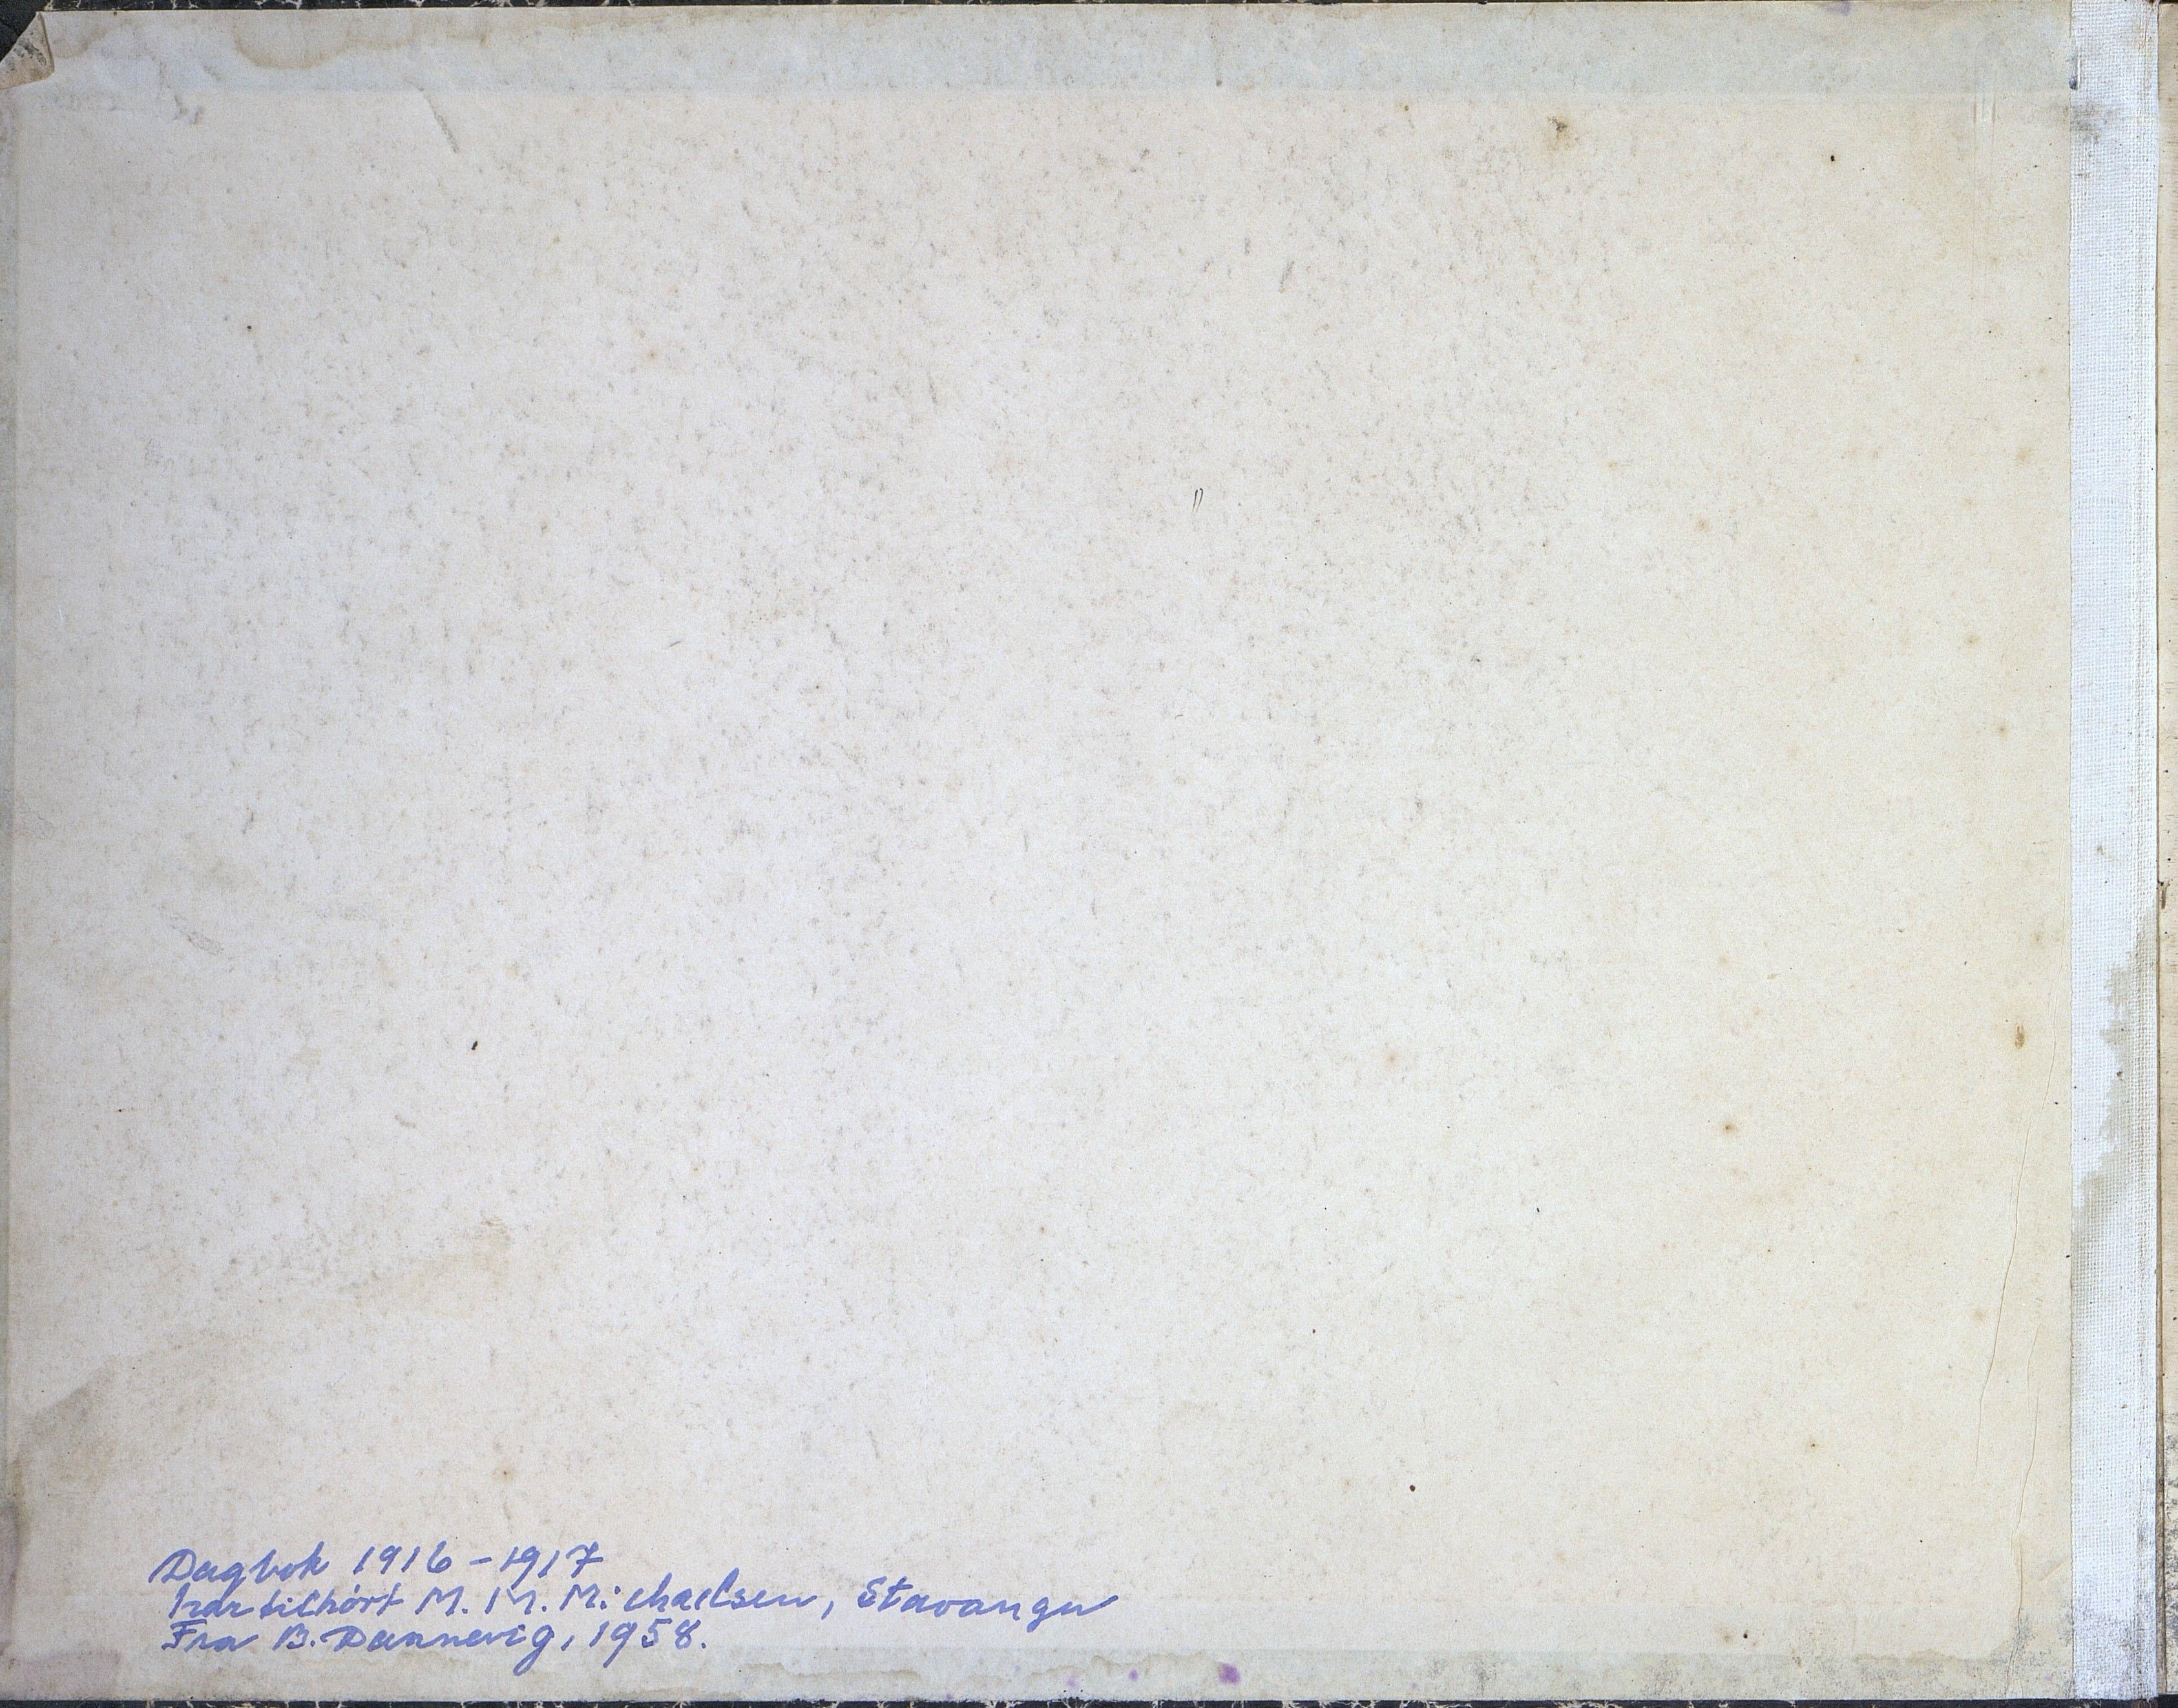 AAKS, Fartøysarkivet, F/L0272: Pehr Ugland (bark), 1891-1929